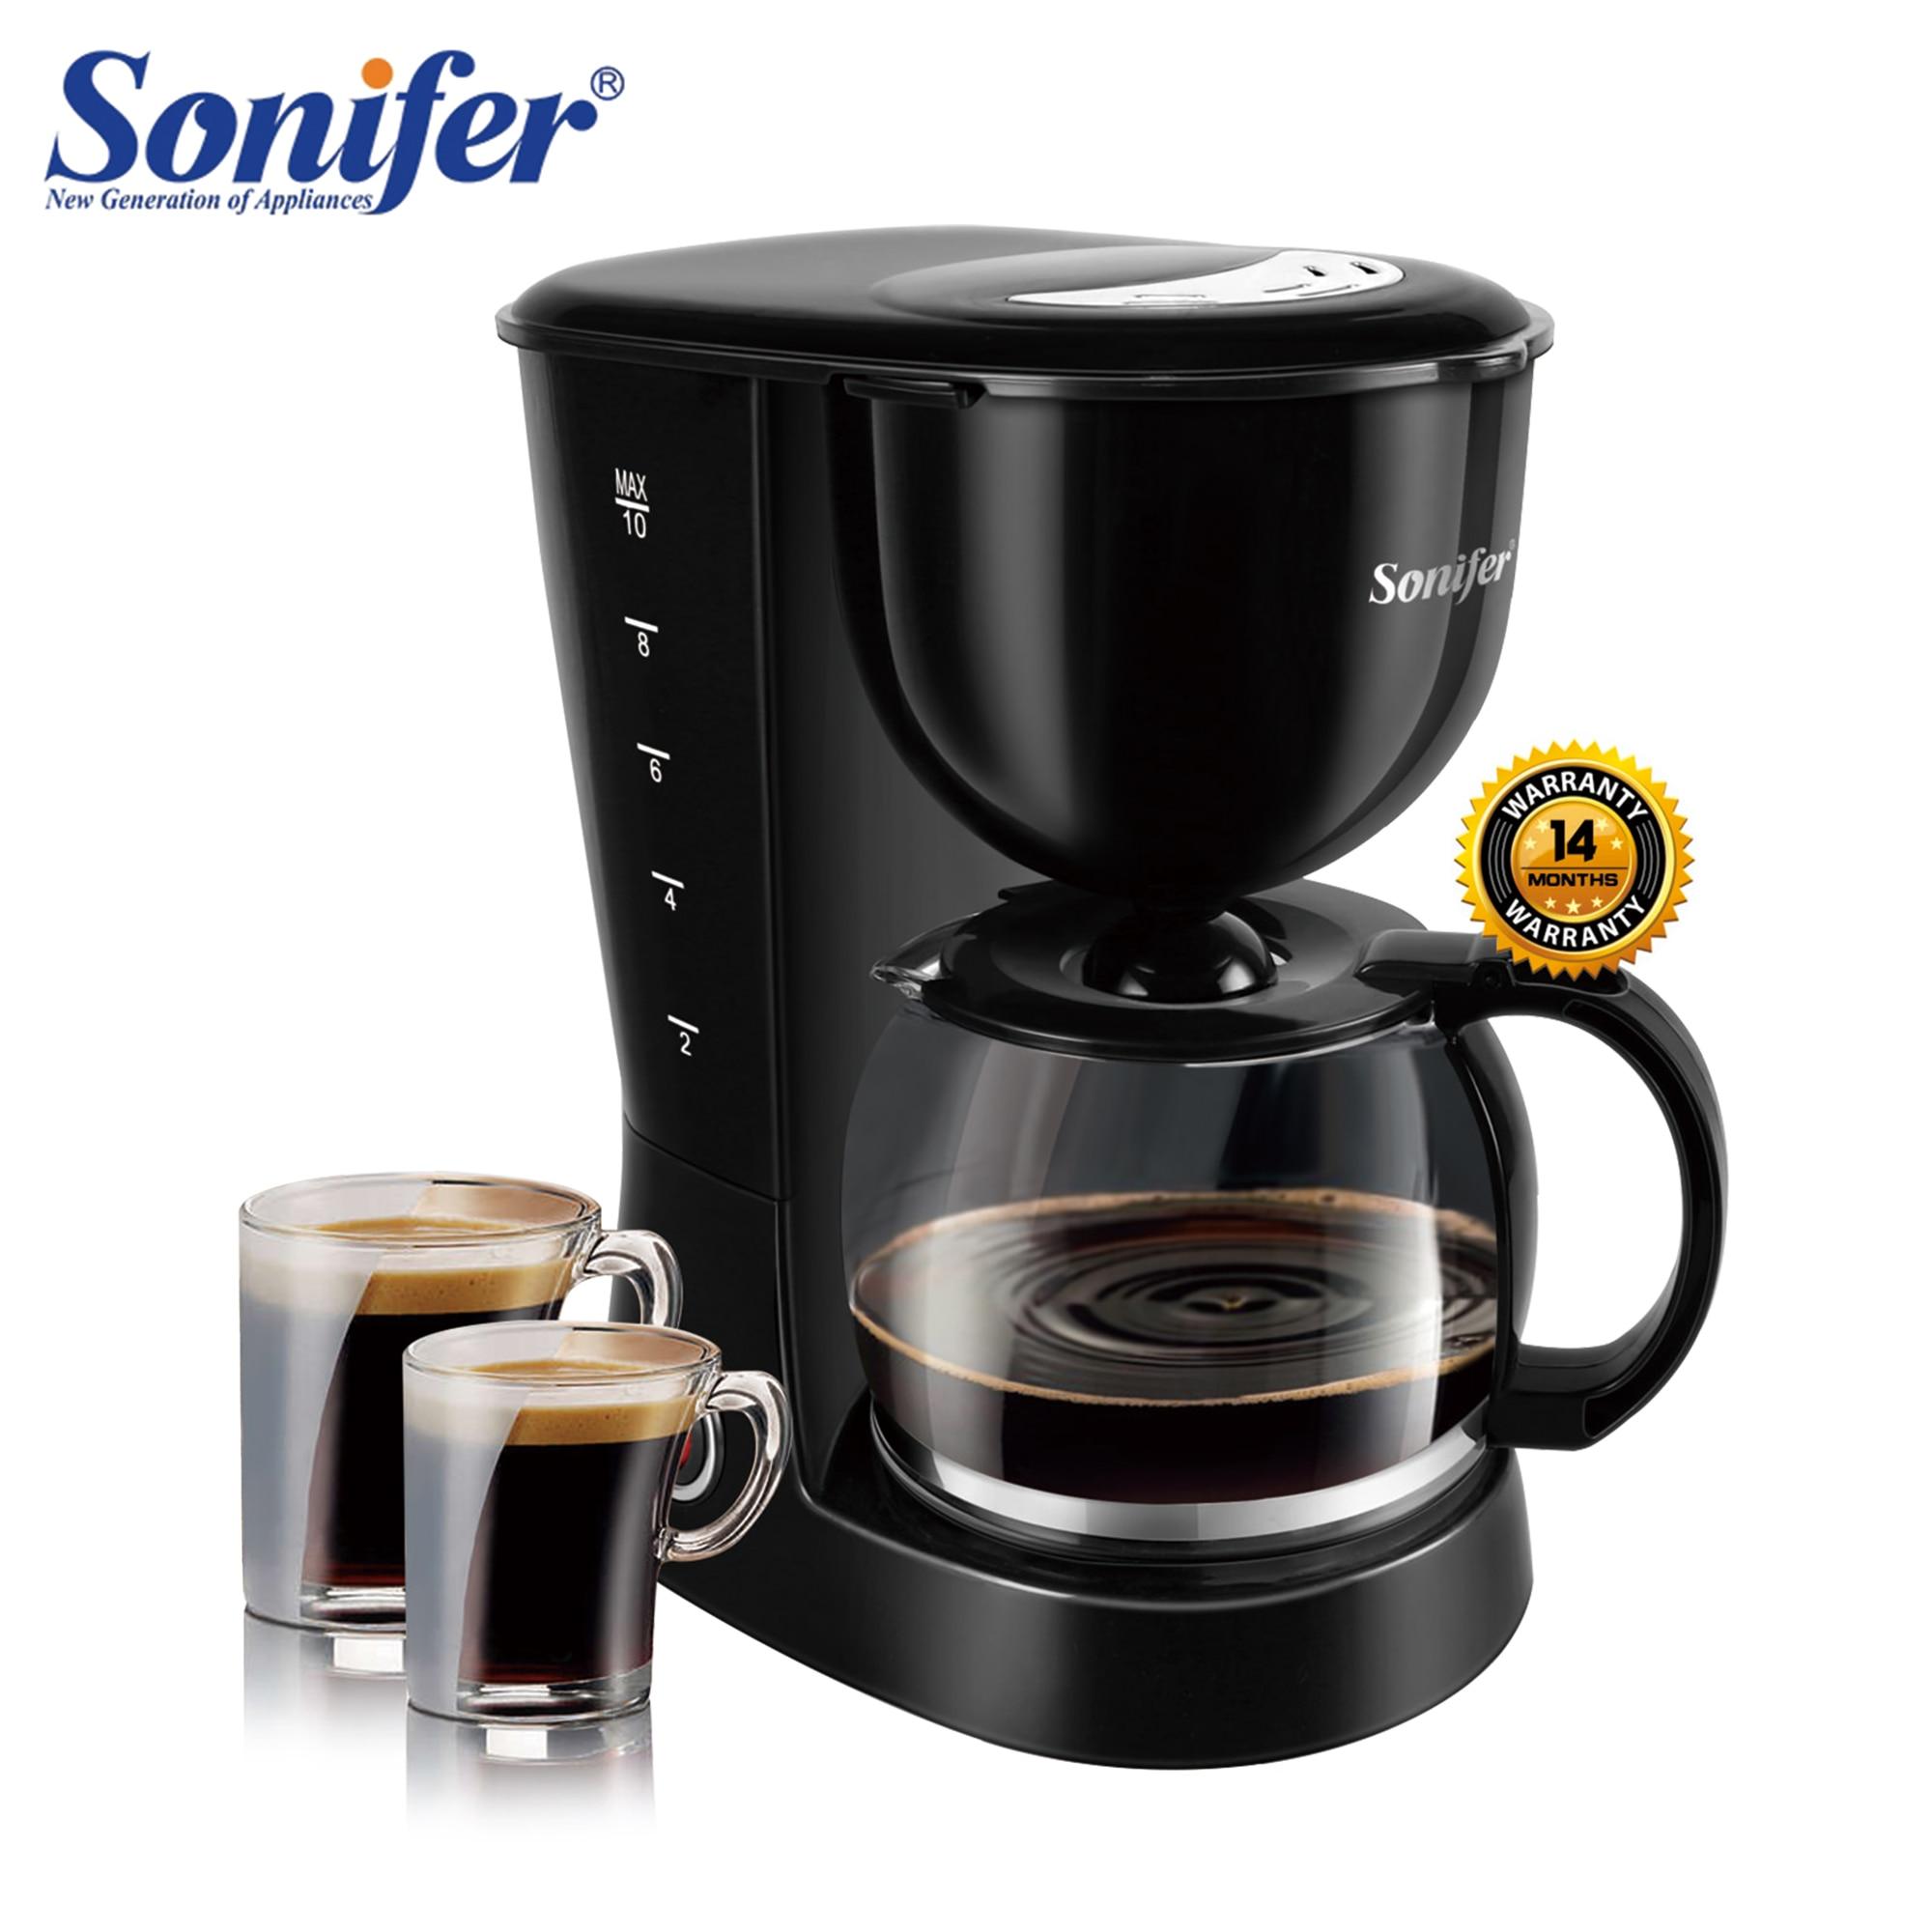 1.25L Electric Drip Coffee Maker 800W Household Coffee Machine 12 Cup Tea Coffee Pot Milk Coffee Maker For Gift 220V Sonifer